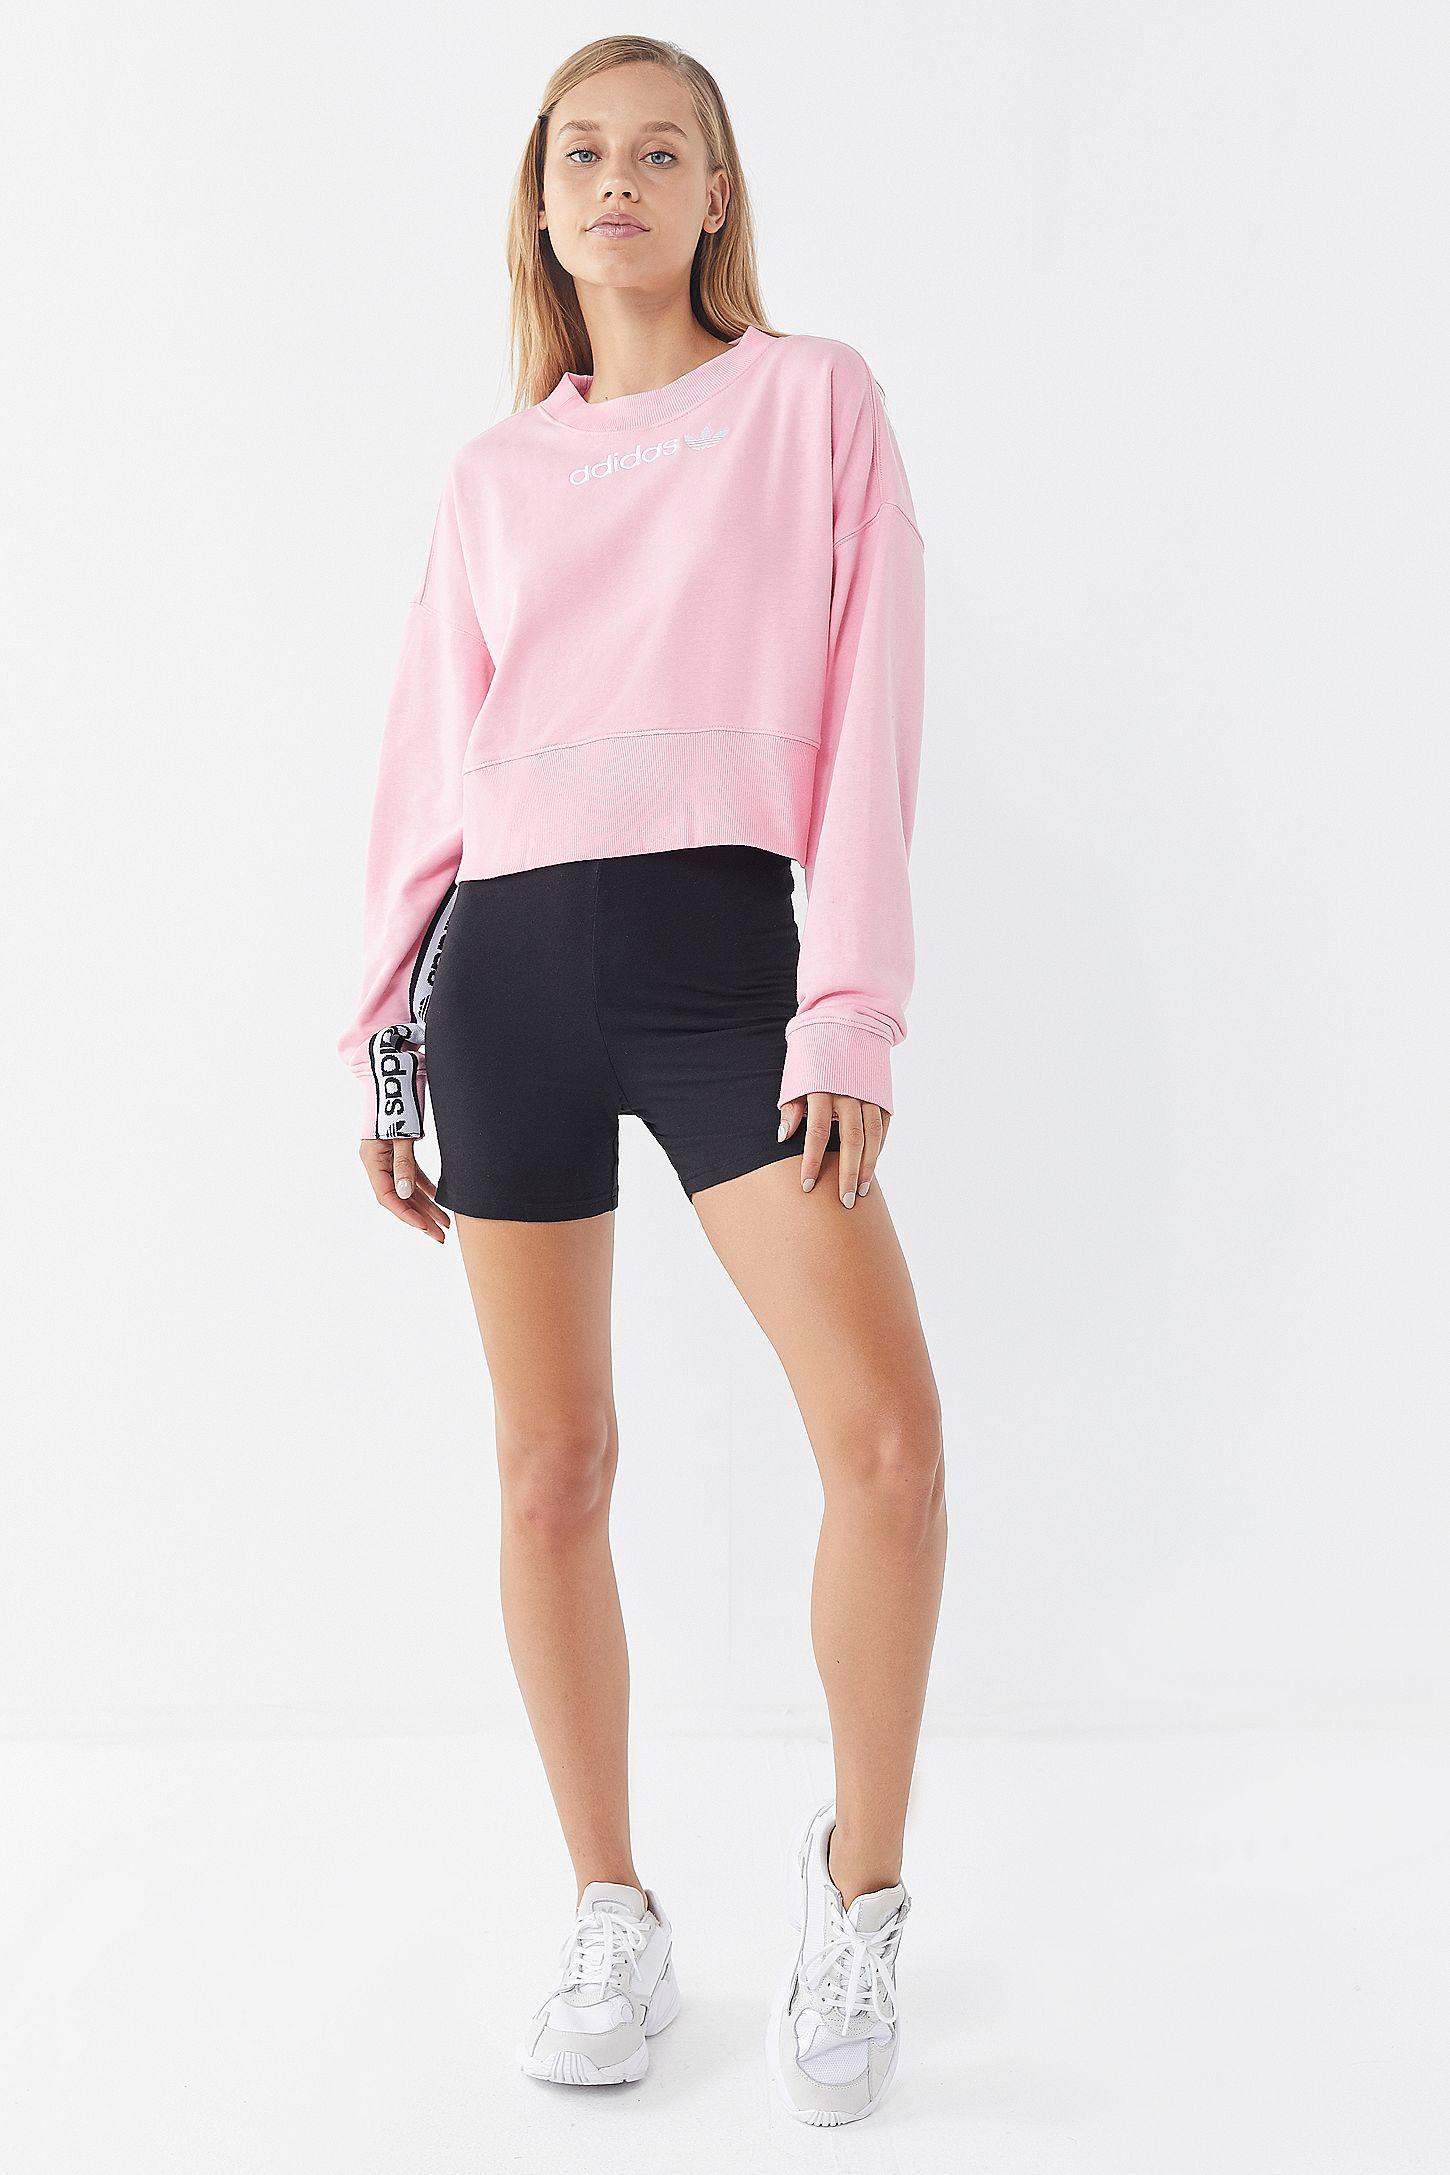 31f909869053 Slide View  4  adidas Originals Side Tape Cropped Sweatshirt